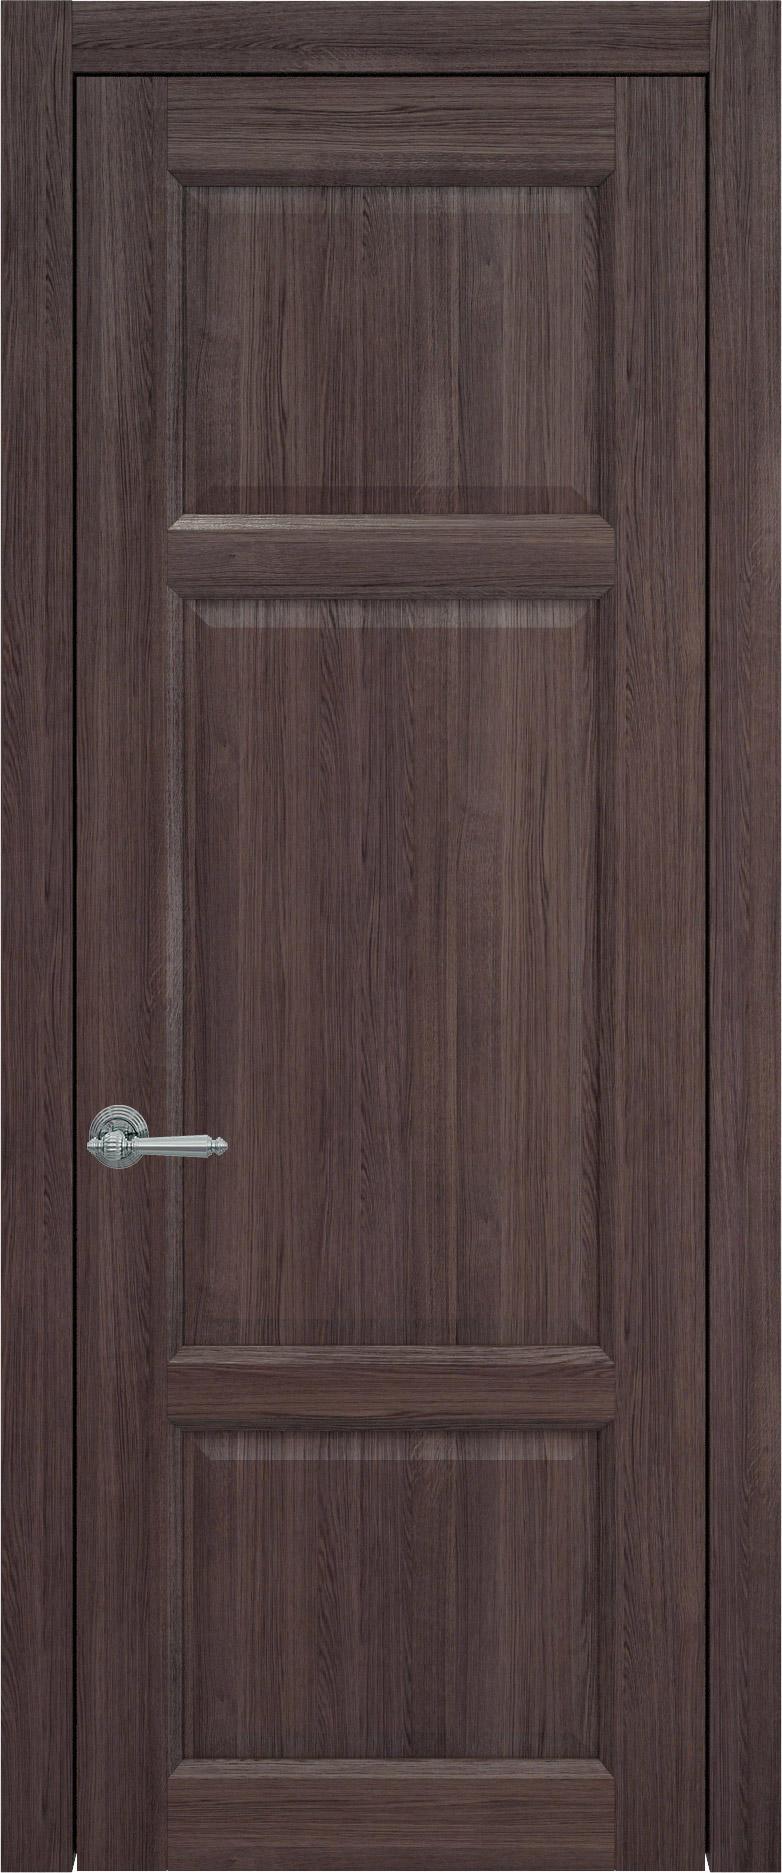 Siena цвет - Венге Нуар Без стекла (ДГ)